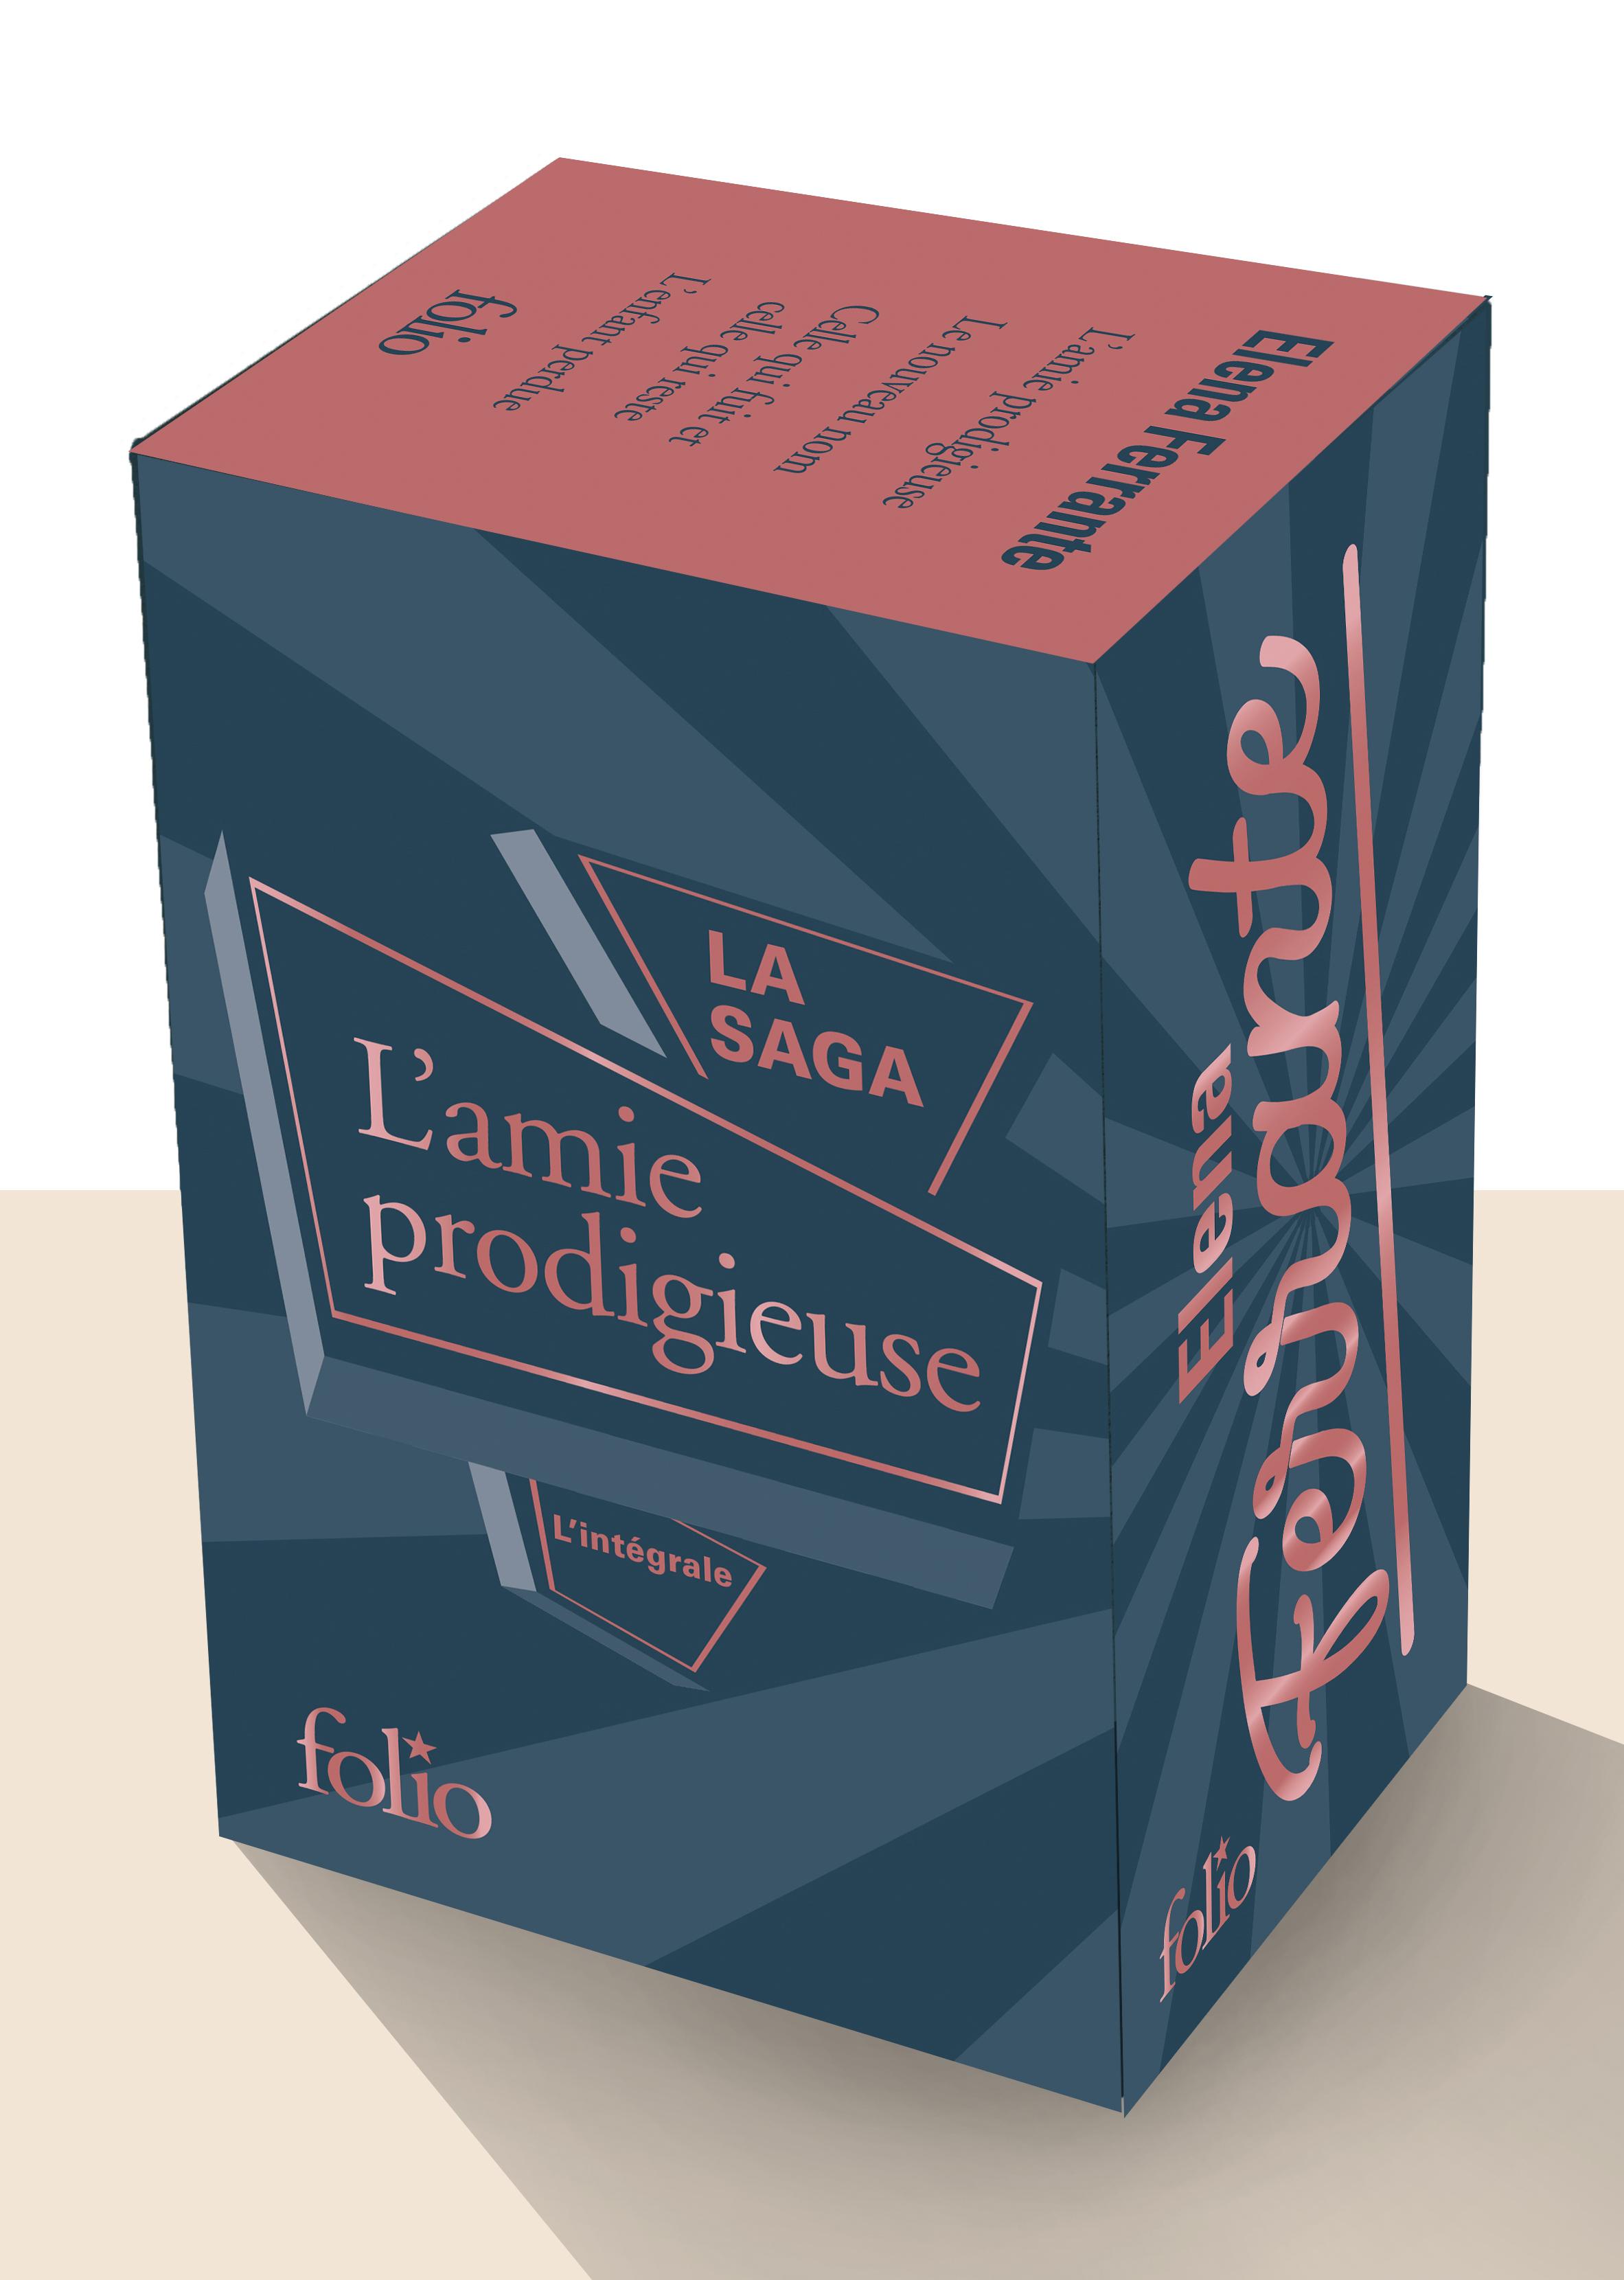 L'AMIE PRODIGIEUSE, I A IV